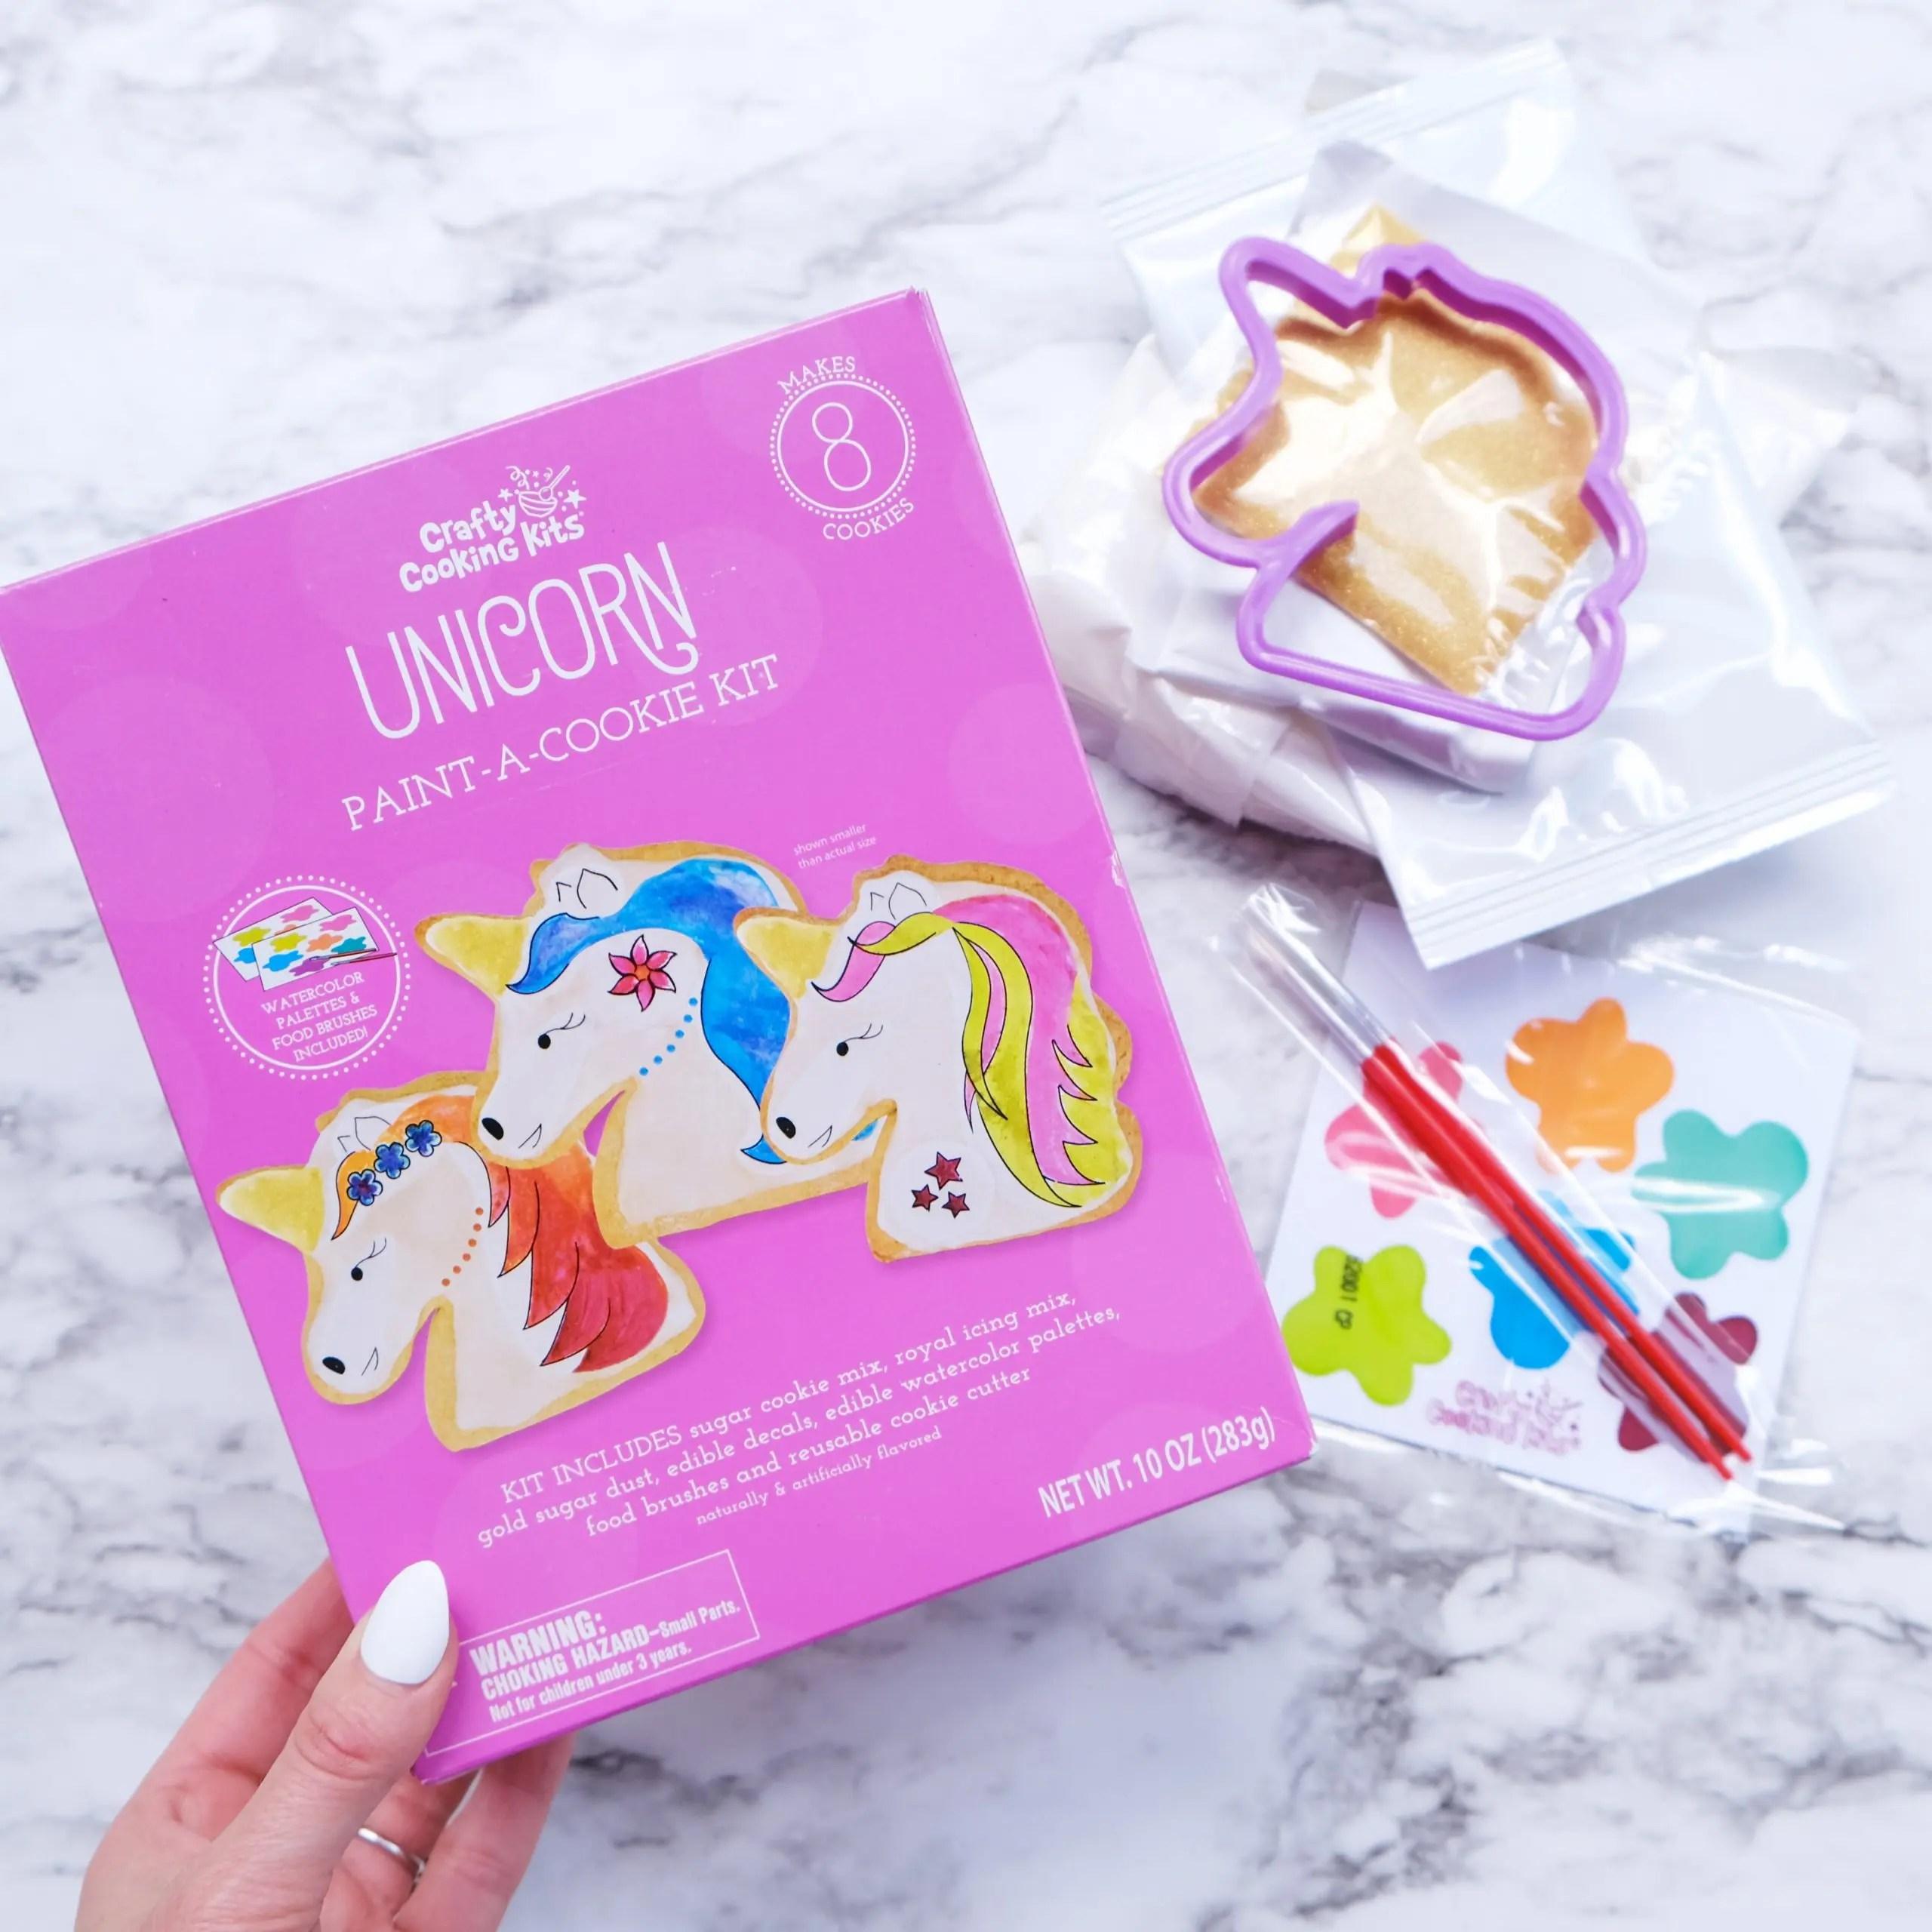 unicorn crafty cooking kits